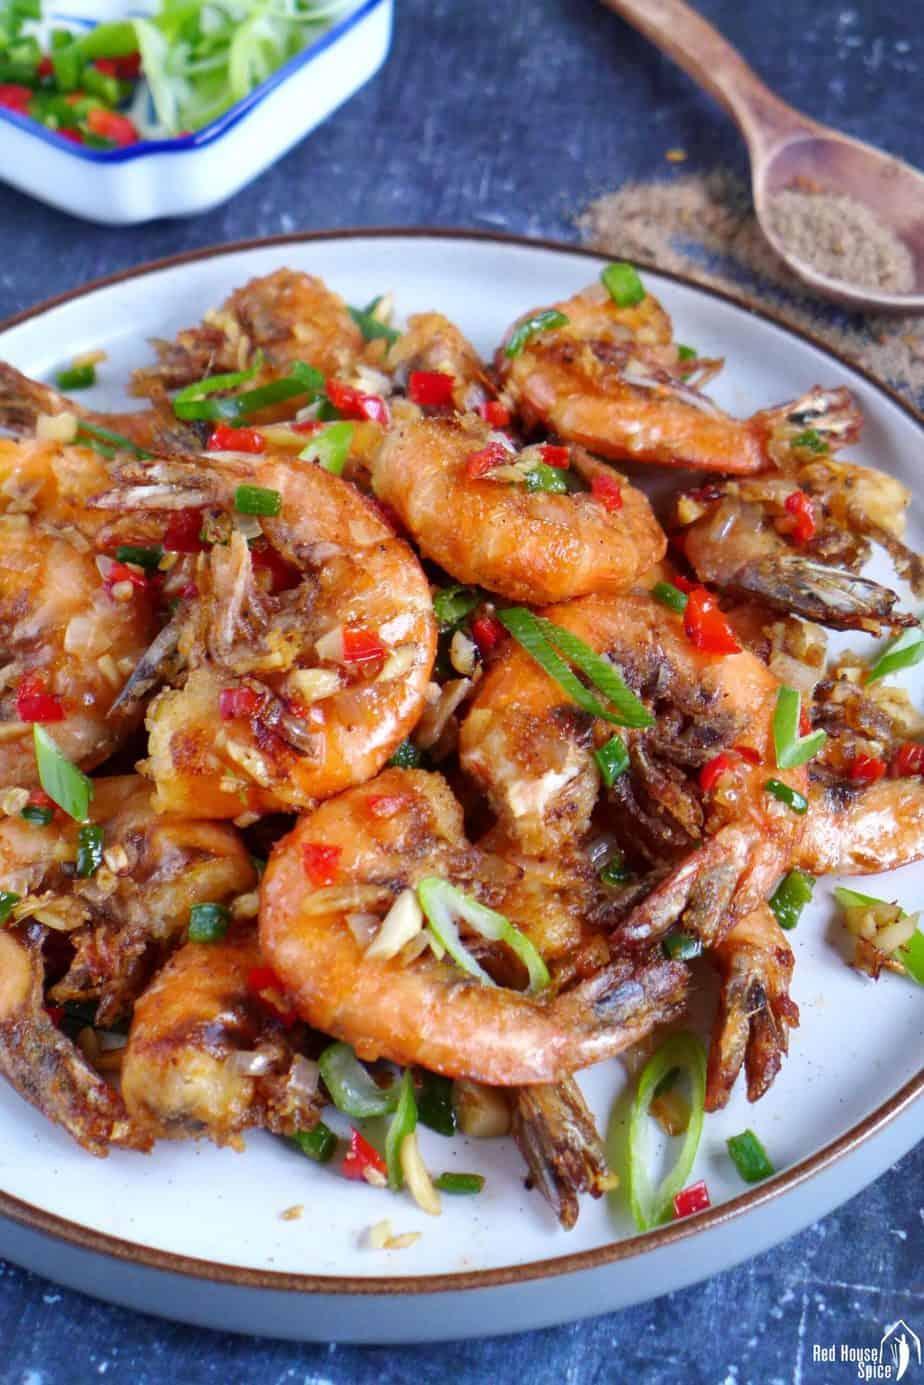 Fried shrimp with salt and pepper seasoning